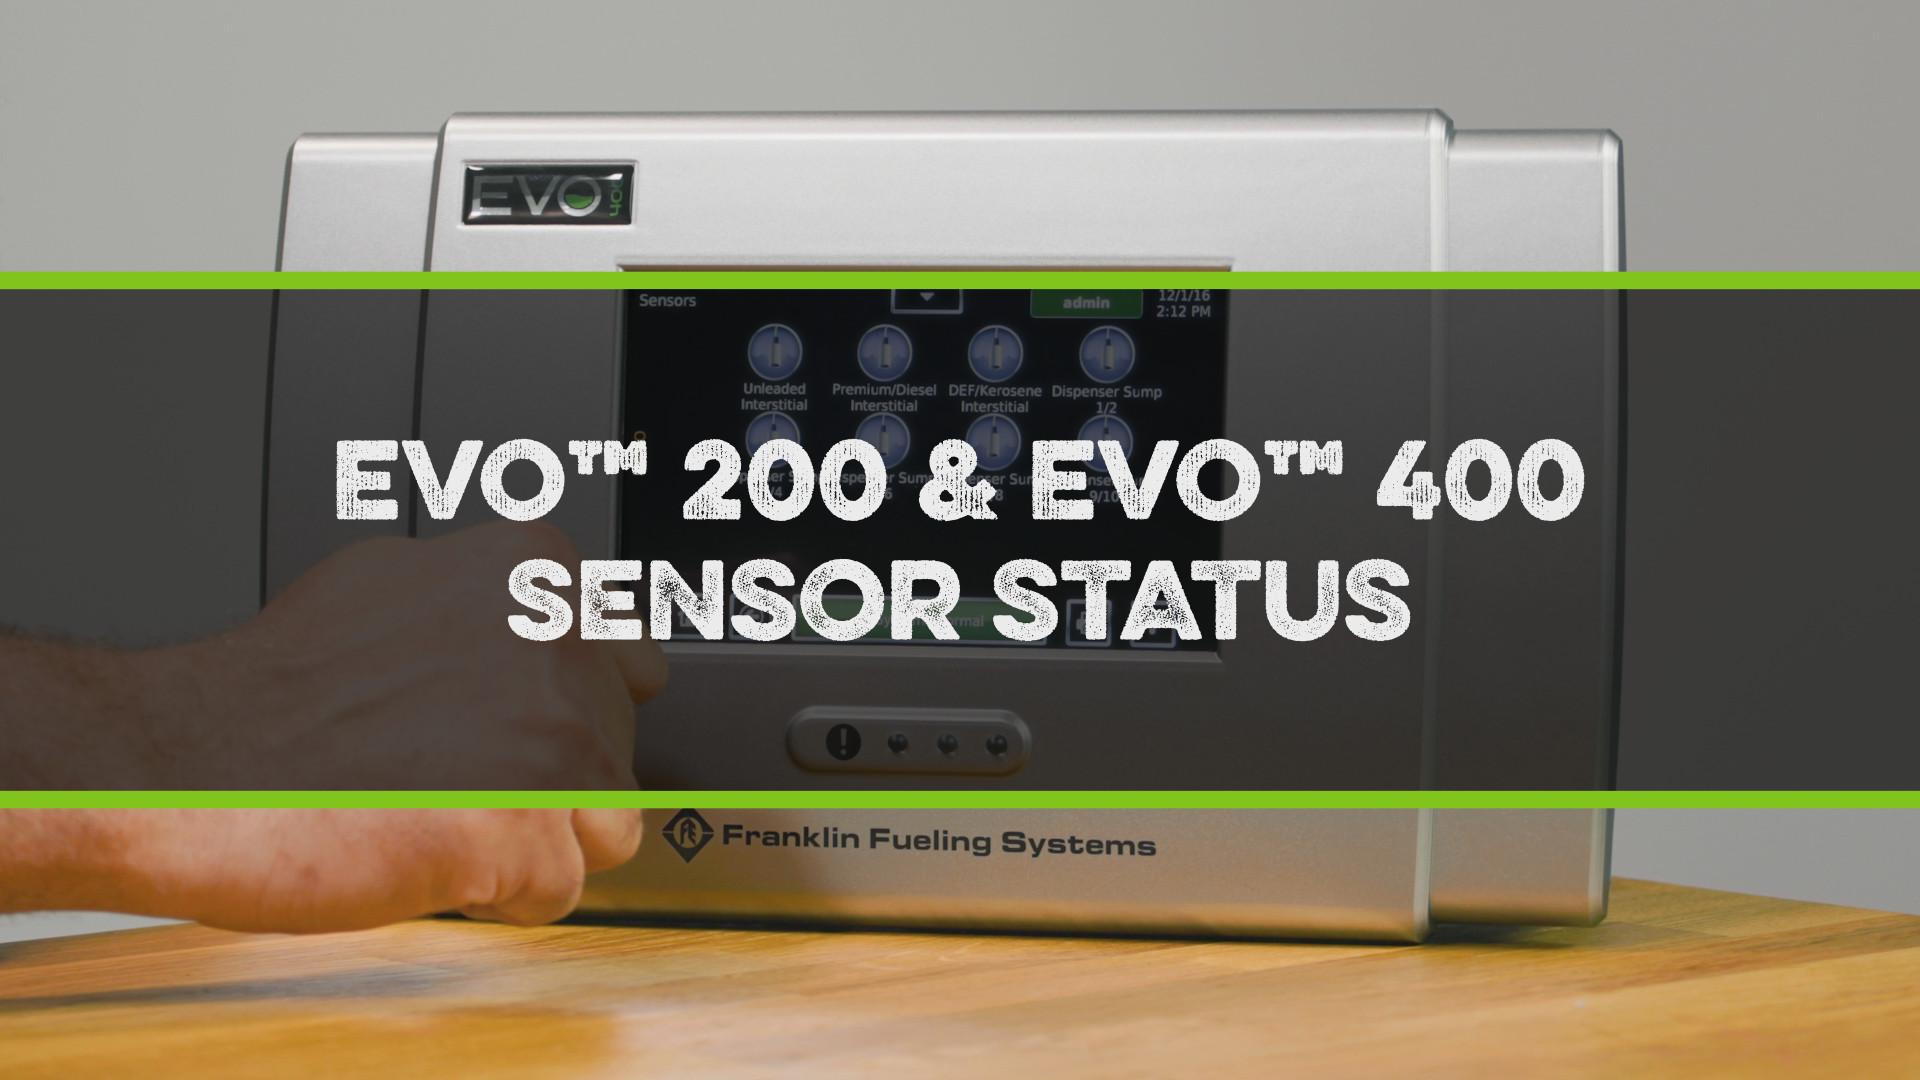 FFS Pro Evo 200-400 Sensor Status Video